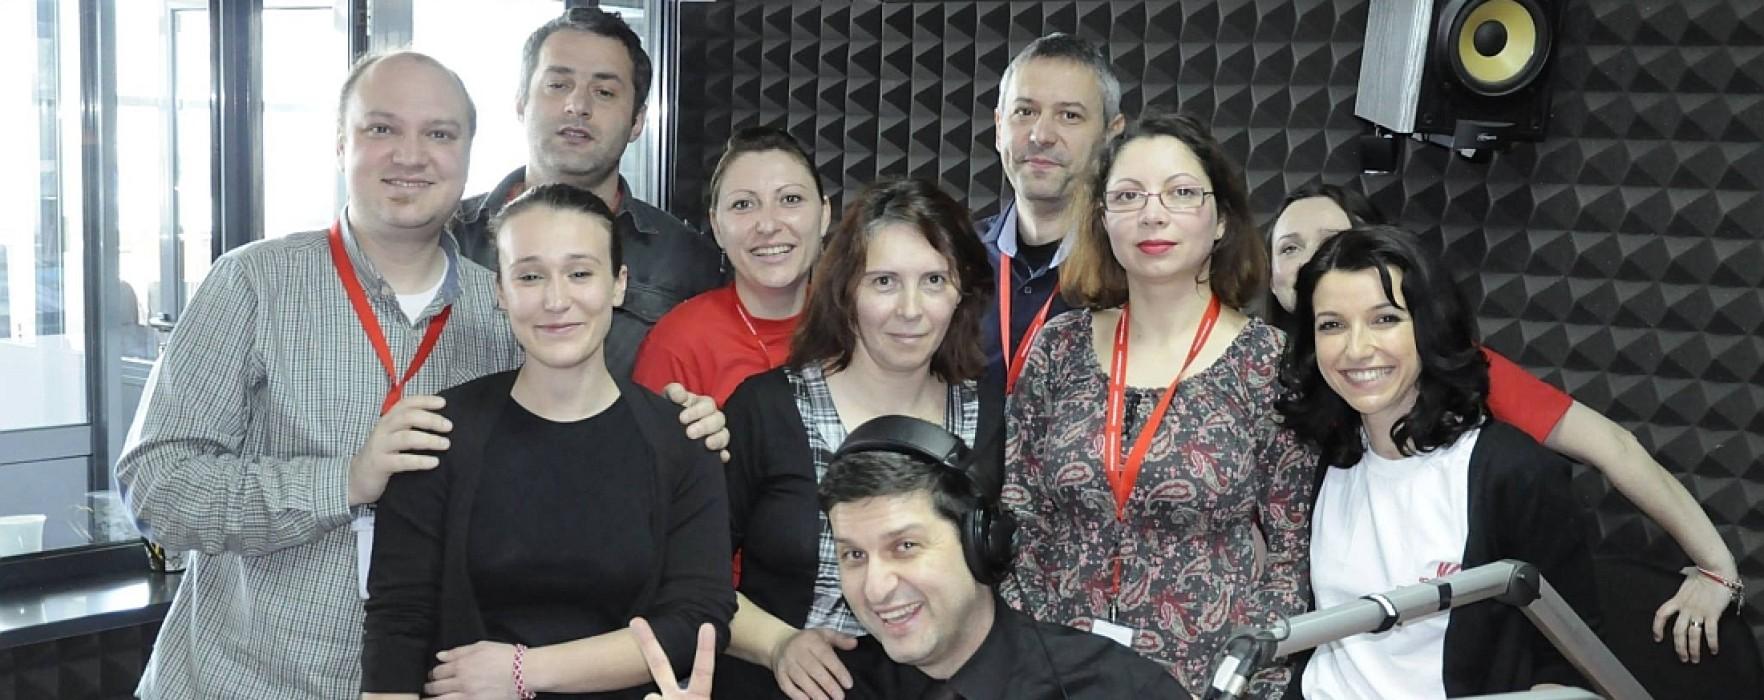 Radio Minisat împlineşte 19 ani